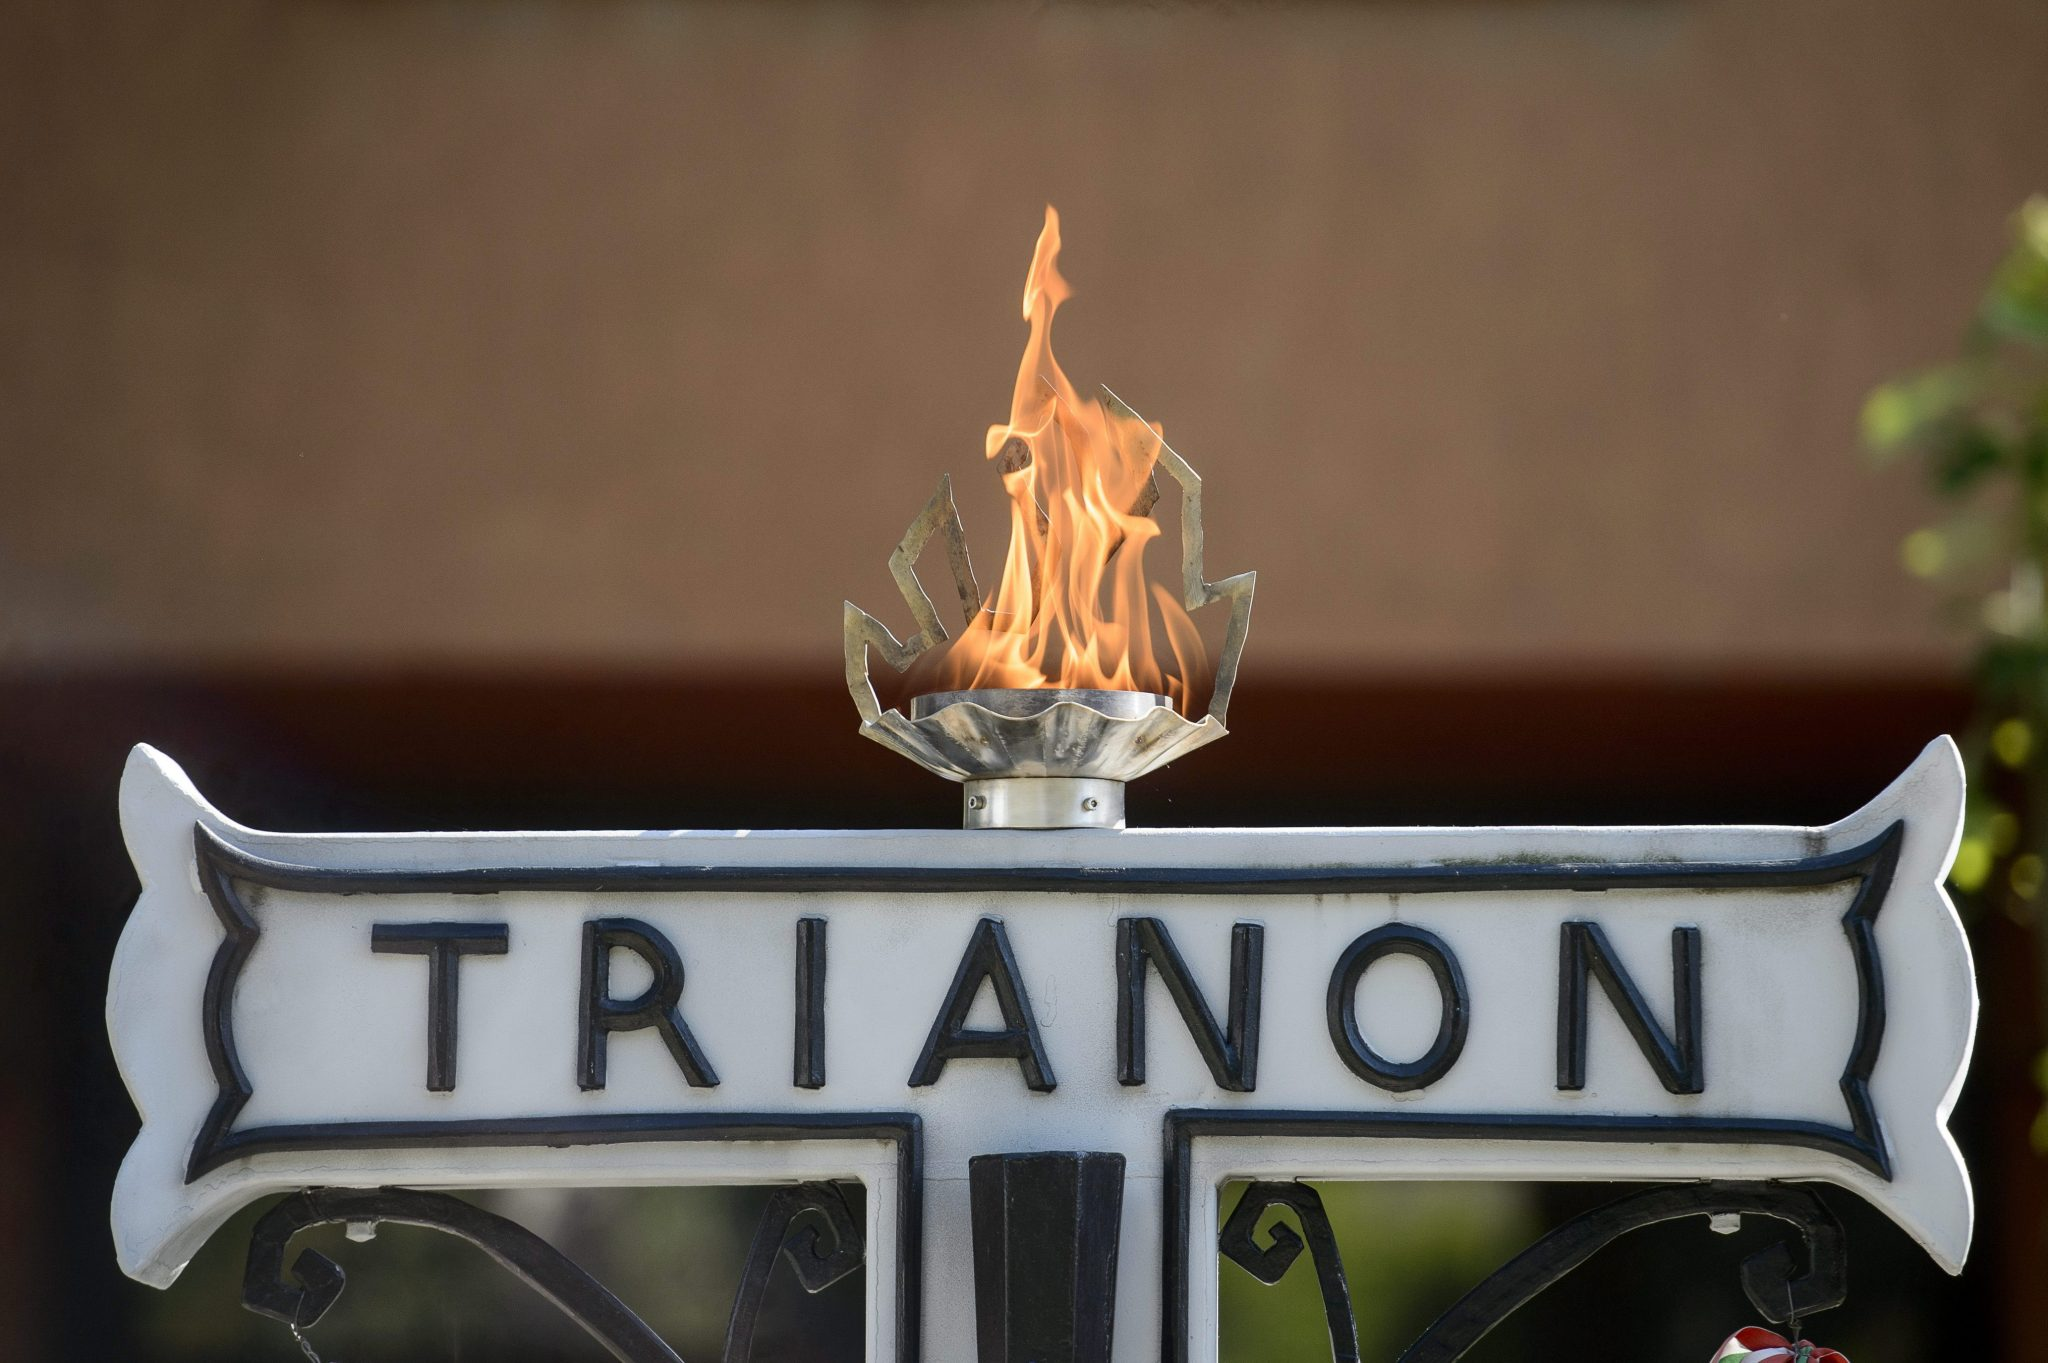 Survey: Vast Majority of Hungarians Believe Trianon Treaty Was 'Unjust, Excessive' post's picture